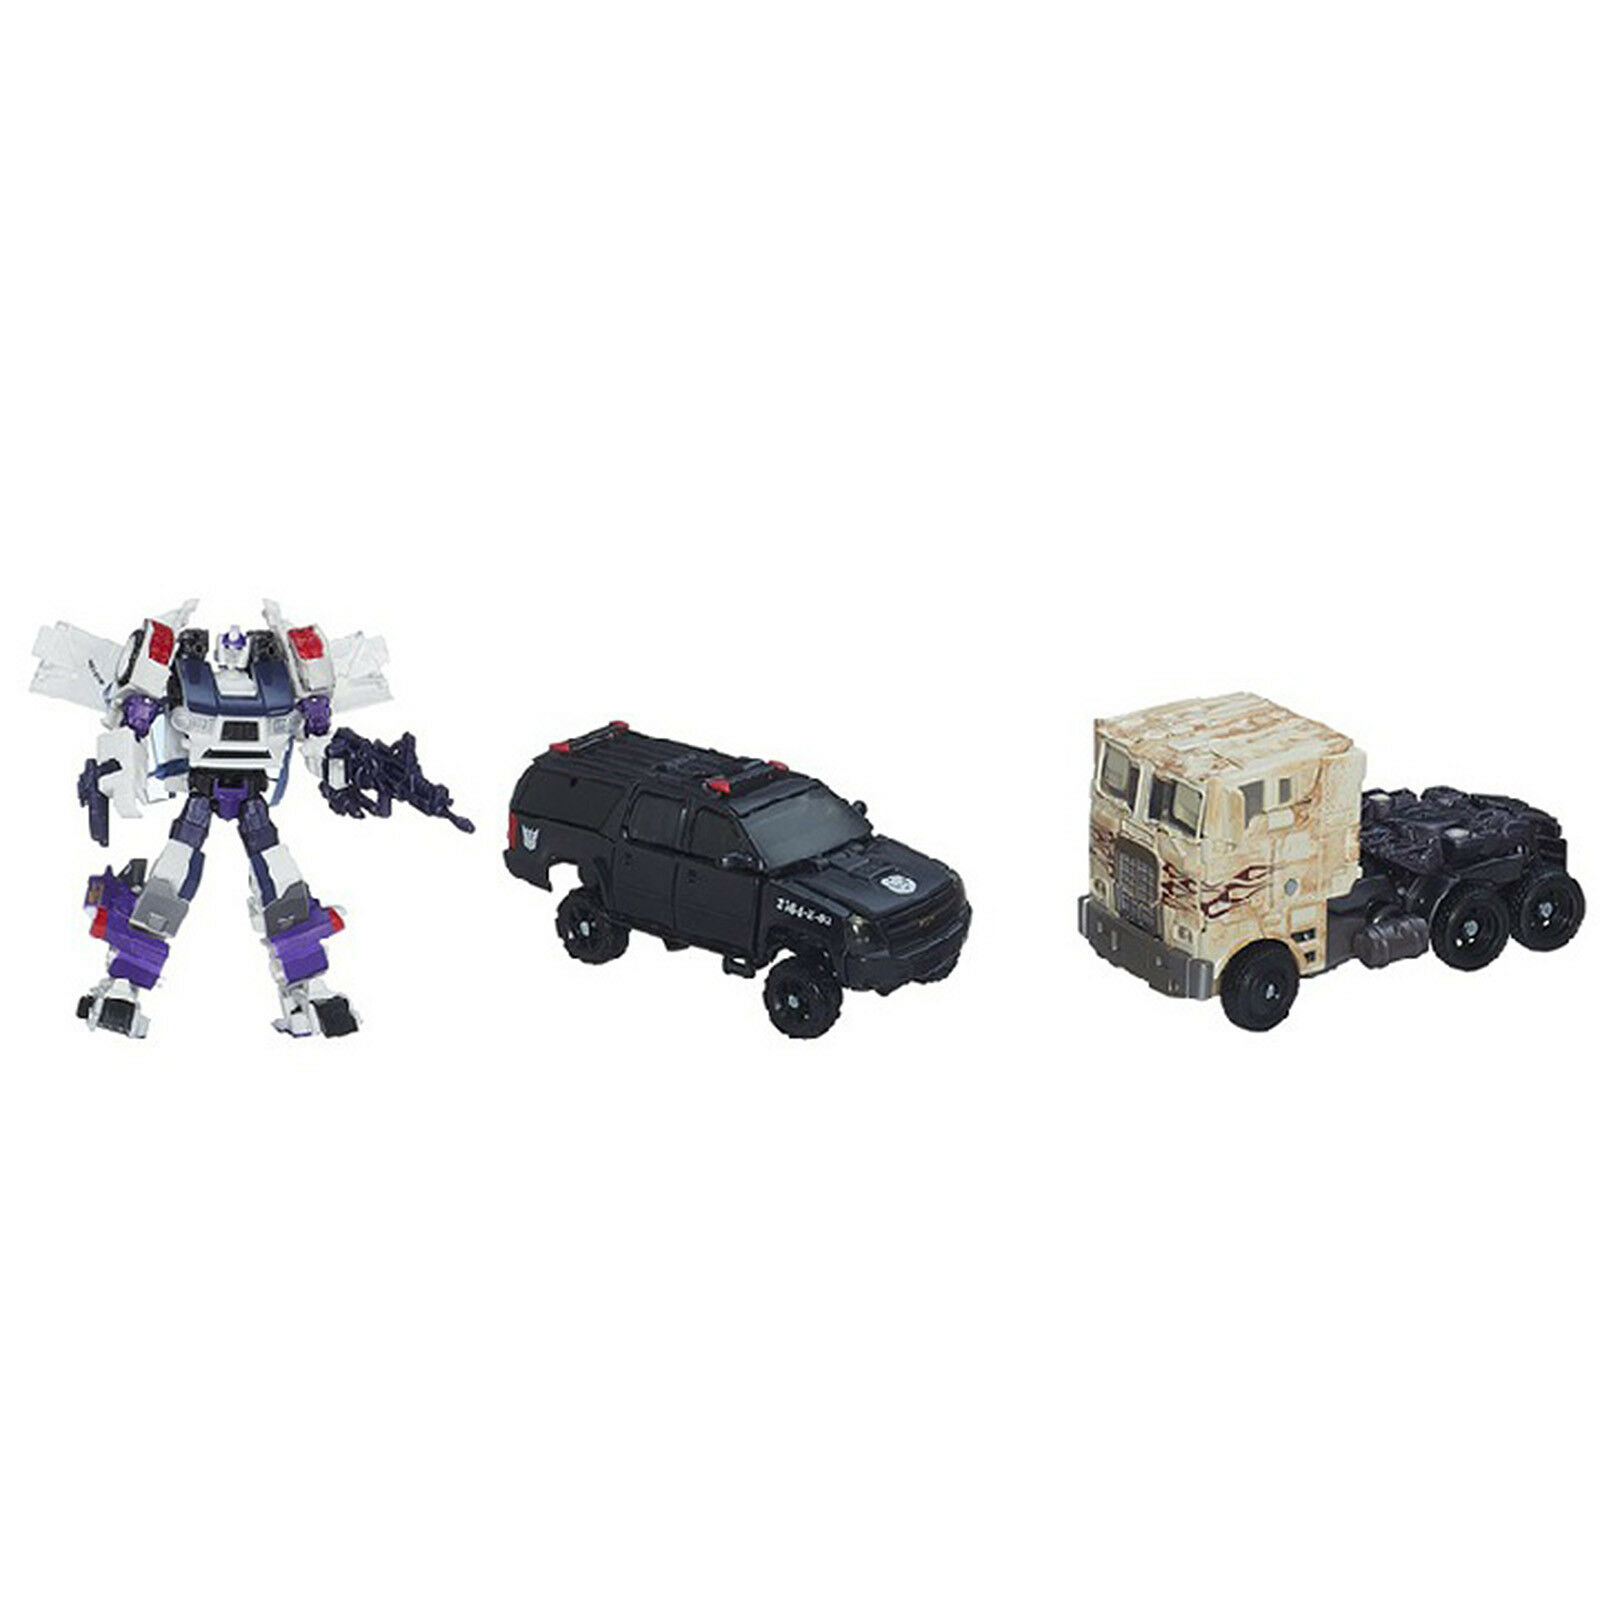 Transformers 4 AOE BREAKOUT BREAKOUT BREAKOUT BATTLE Optimus Prime Vehicon Rollbar Action Figure 3b48be